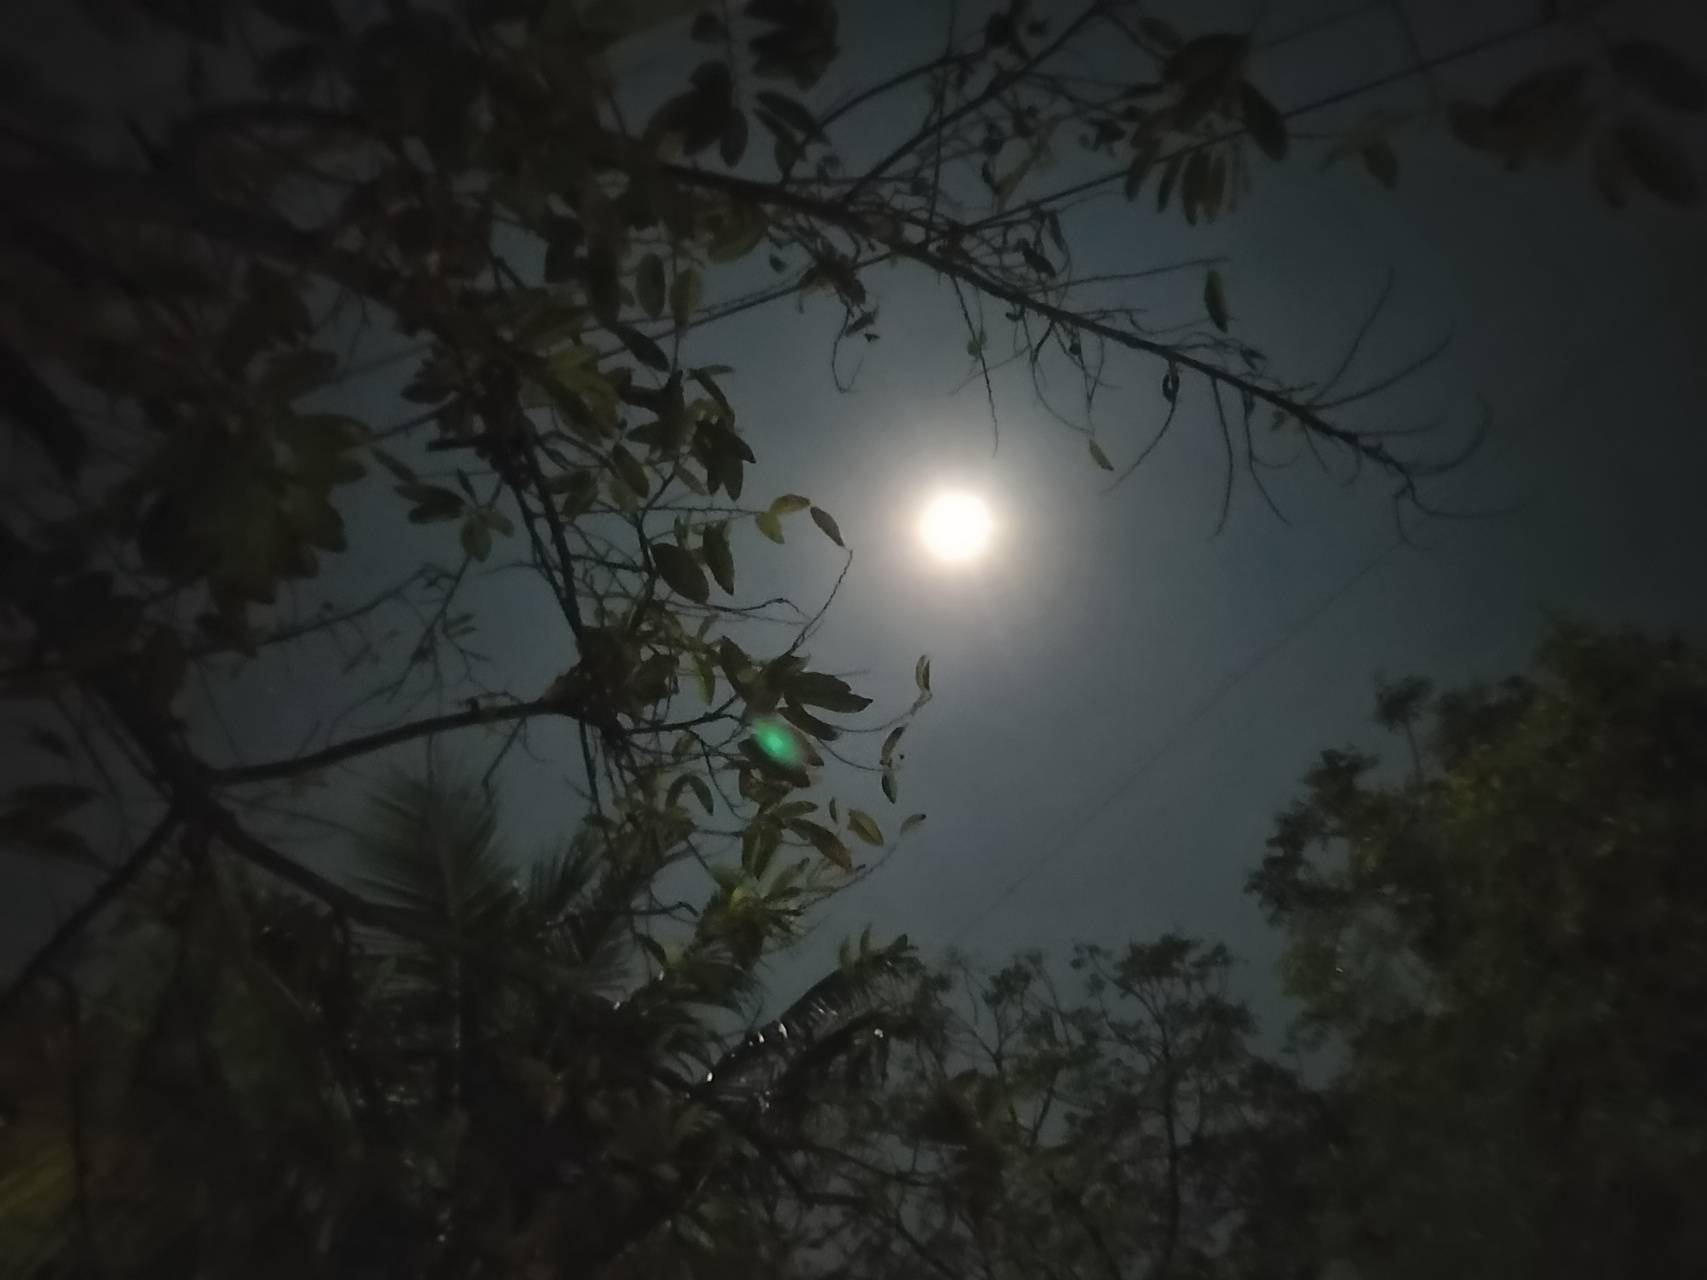 Silence of night